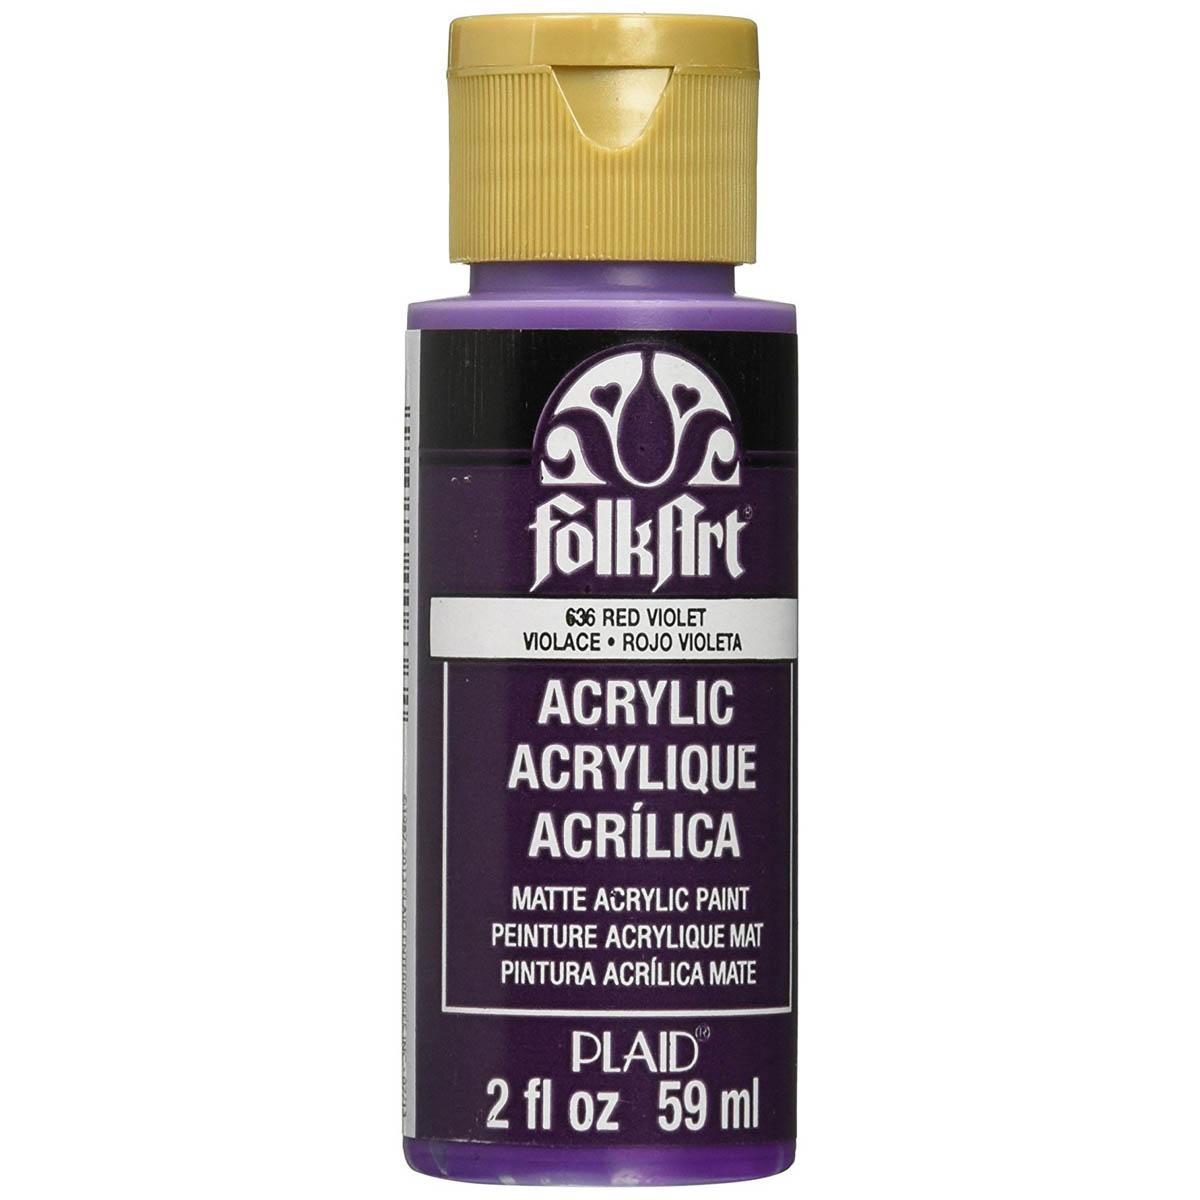 FolkArt ® Acrylic Colors - Red Violet, 2 oz.